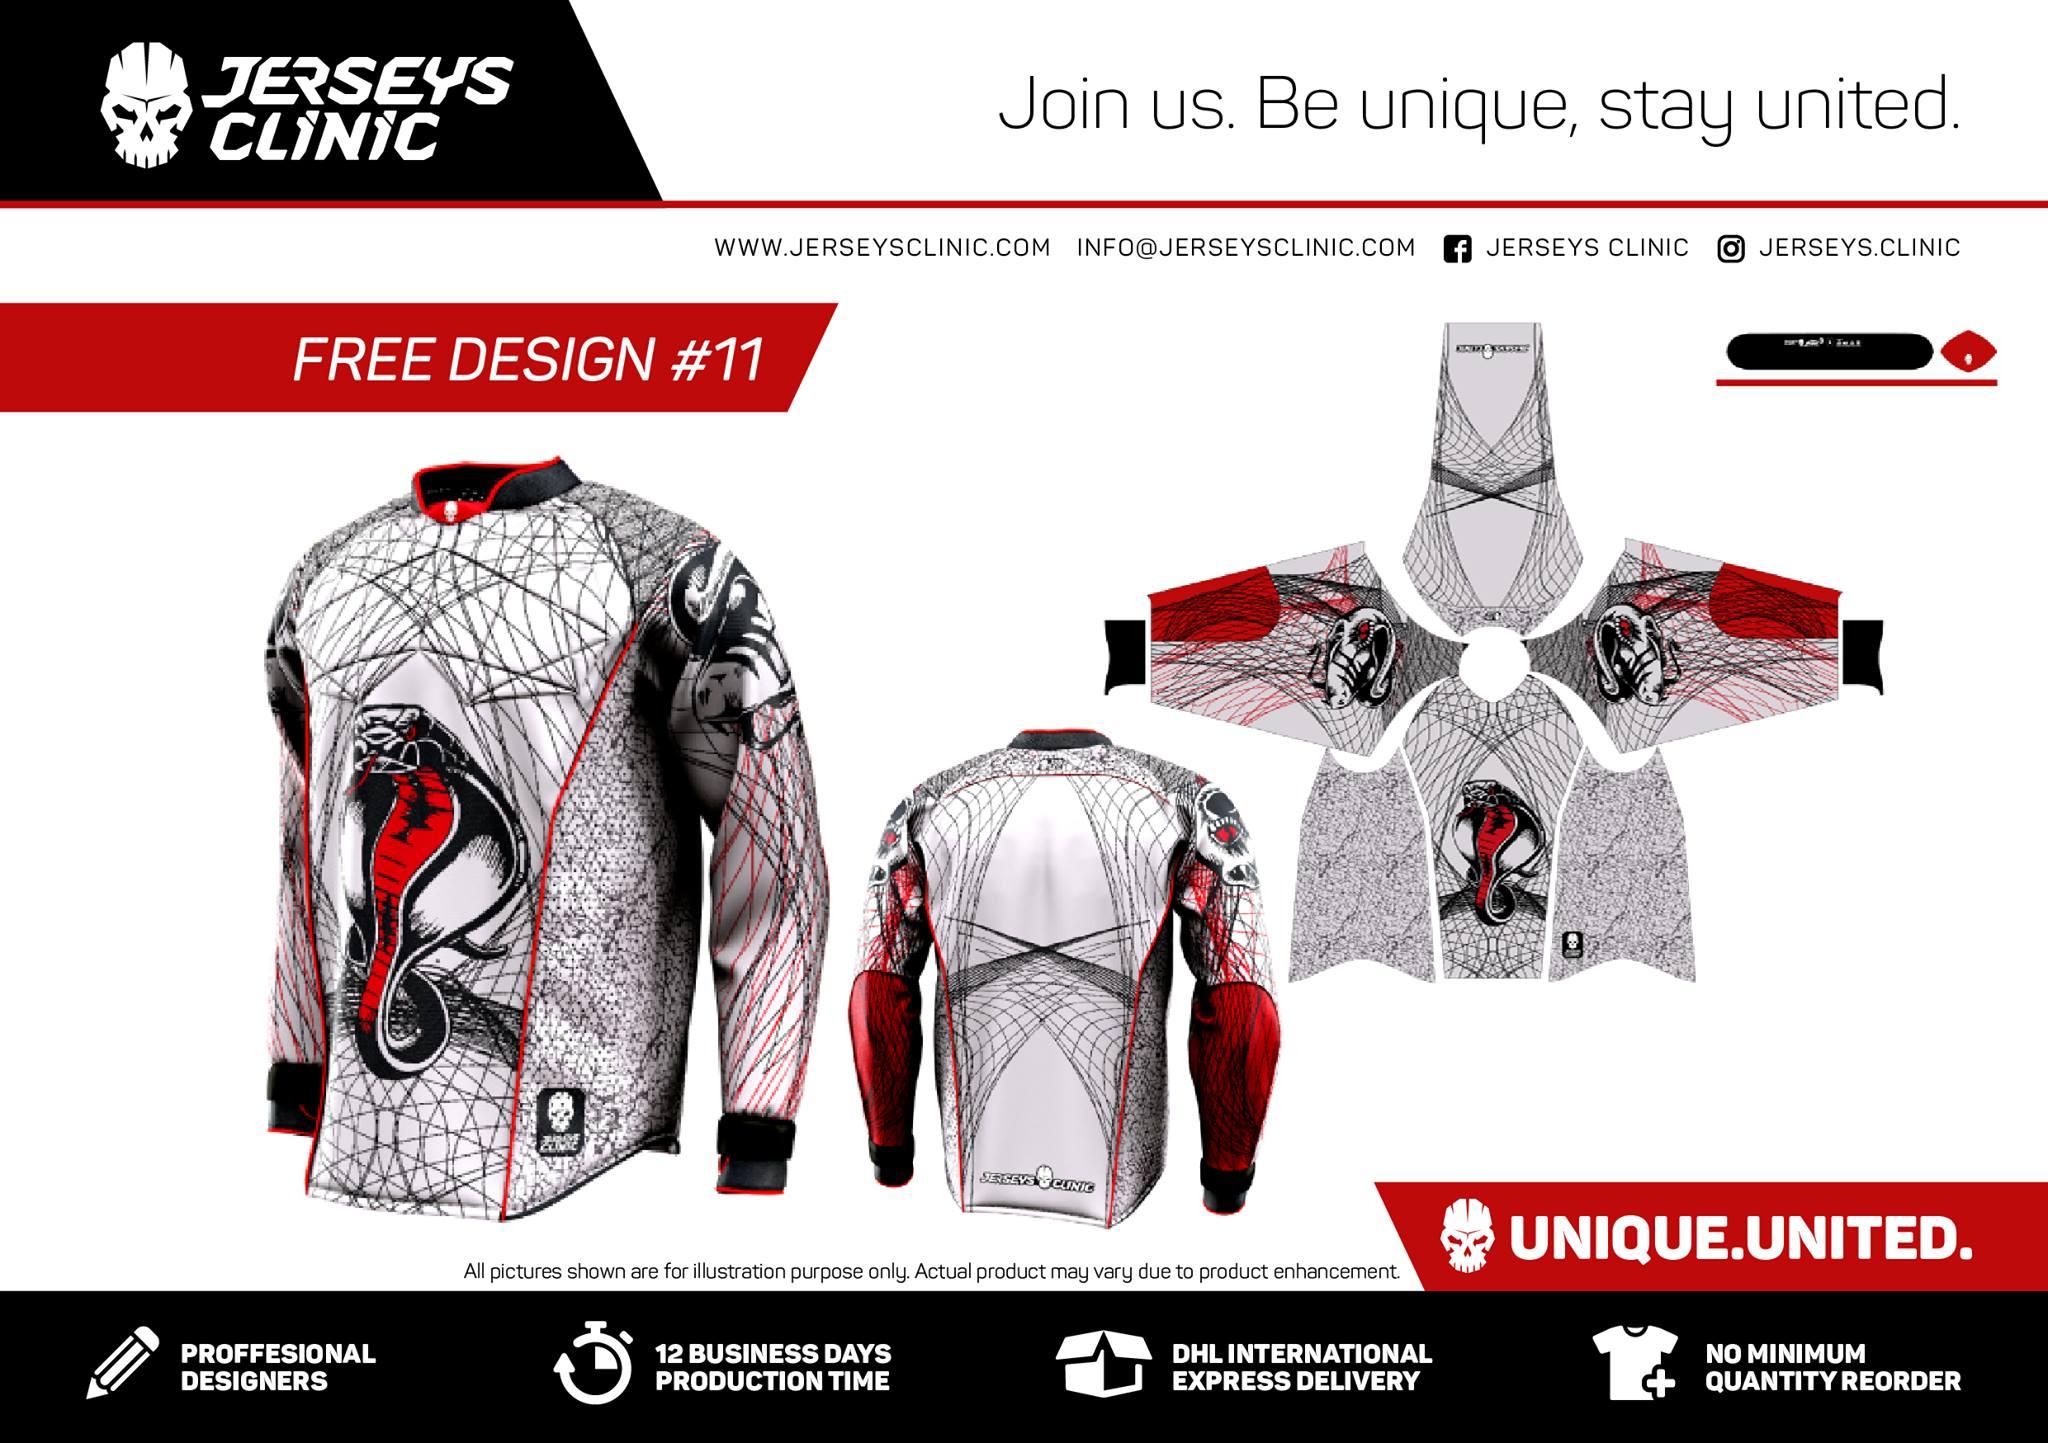 Custom Design Shirt No Minimum - Nils Stucki Kieferorthopäde